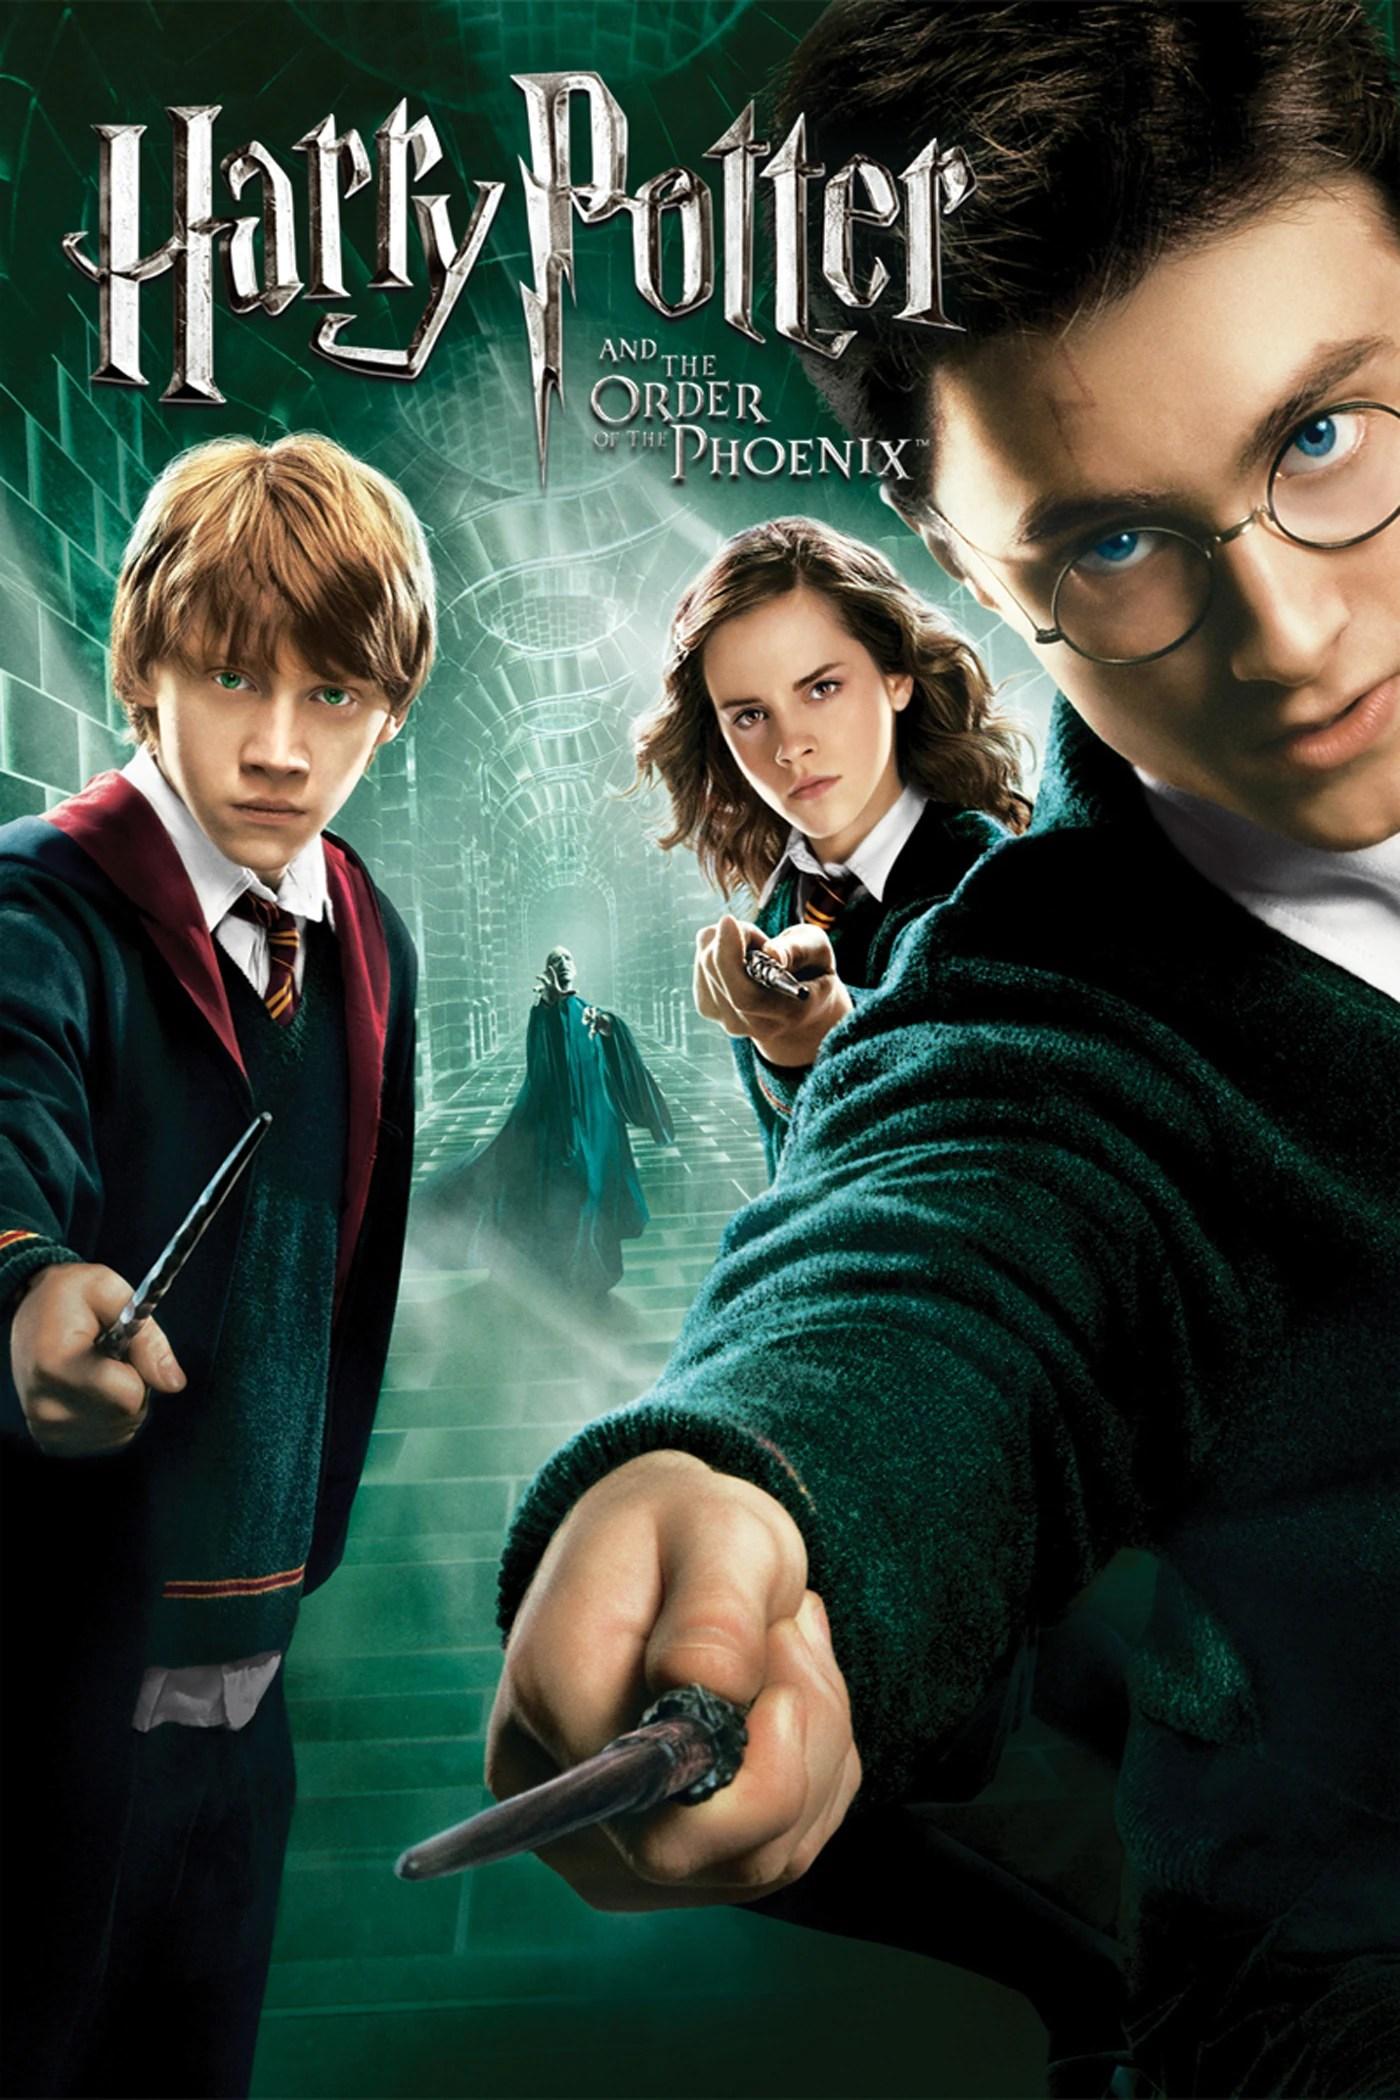 Harry Potter En 5 Minutes : harry, potter, minutes, Harry, Potter, Order, Phoenix, (film), Fandom